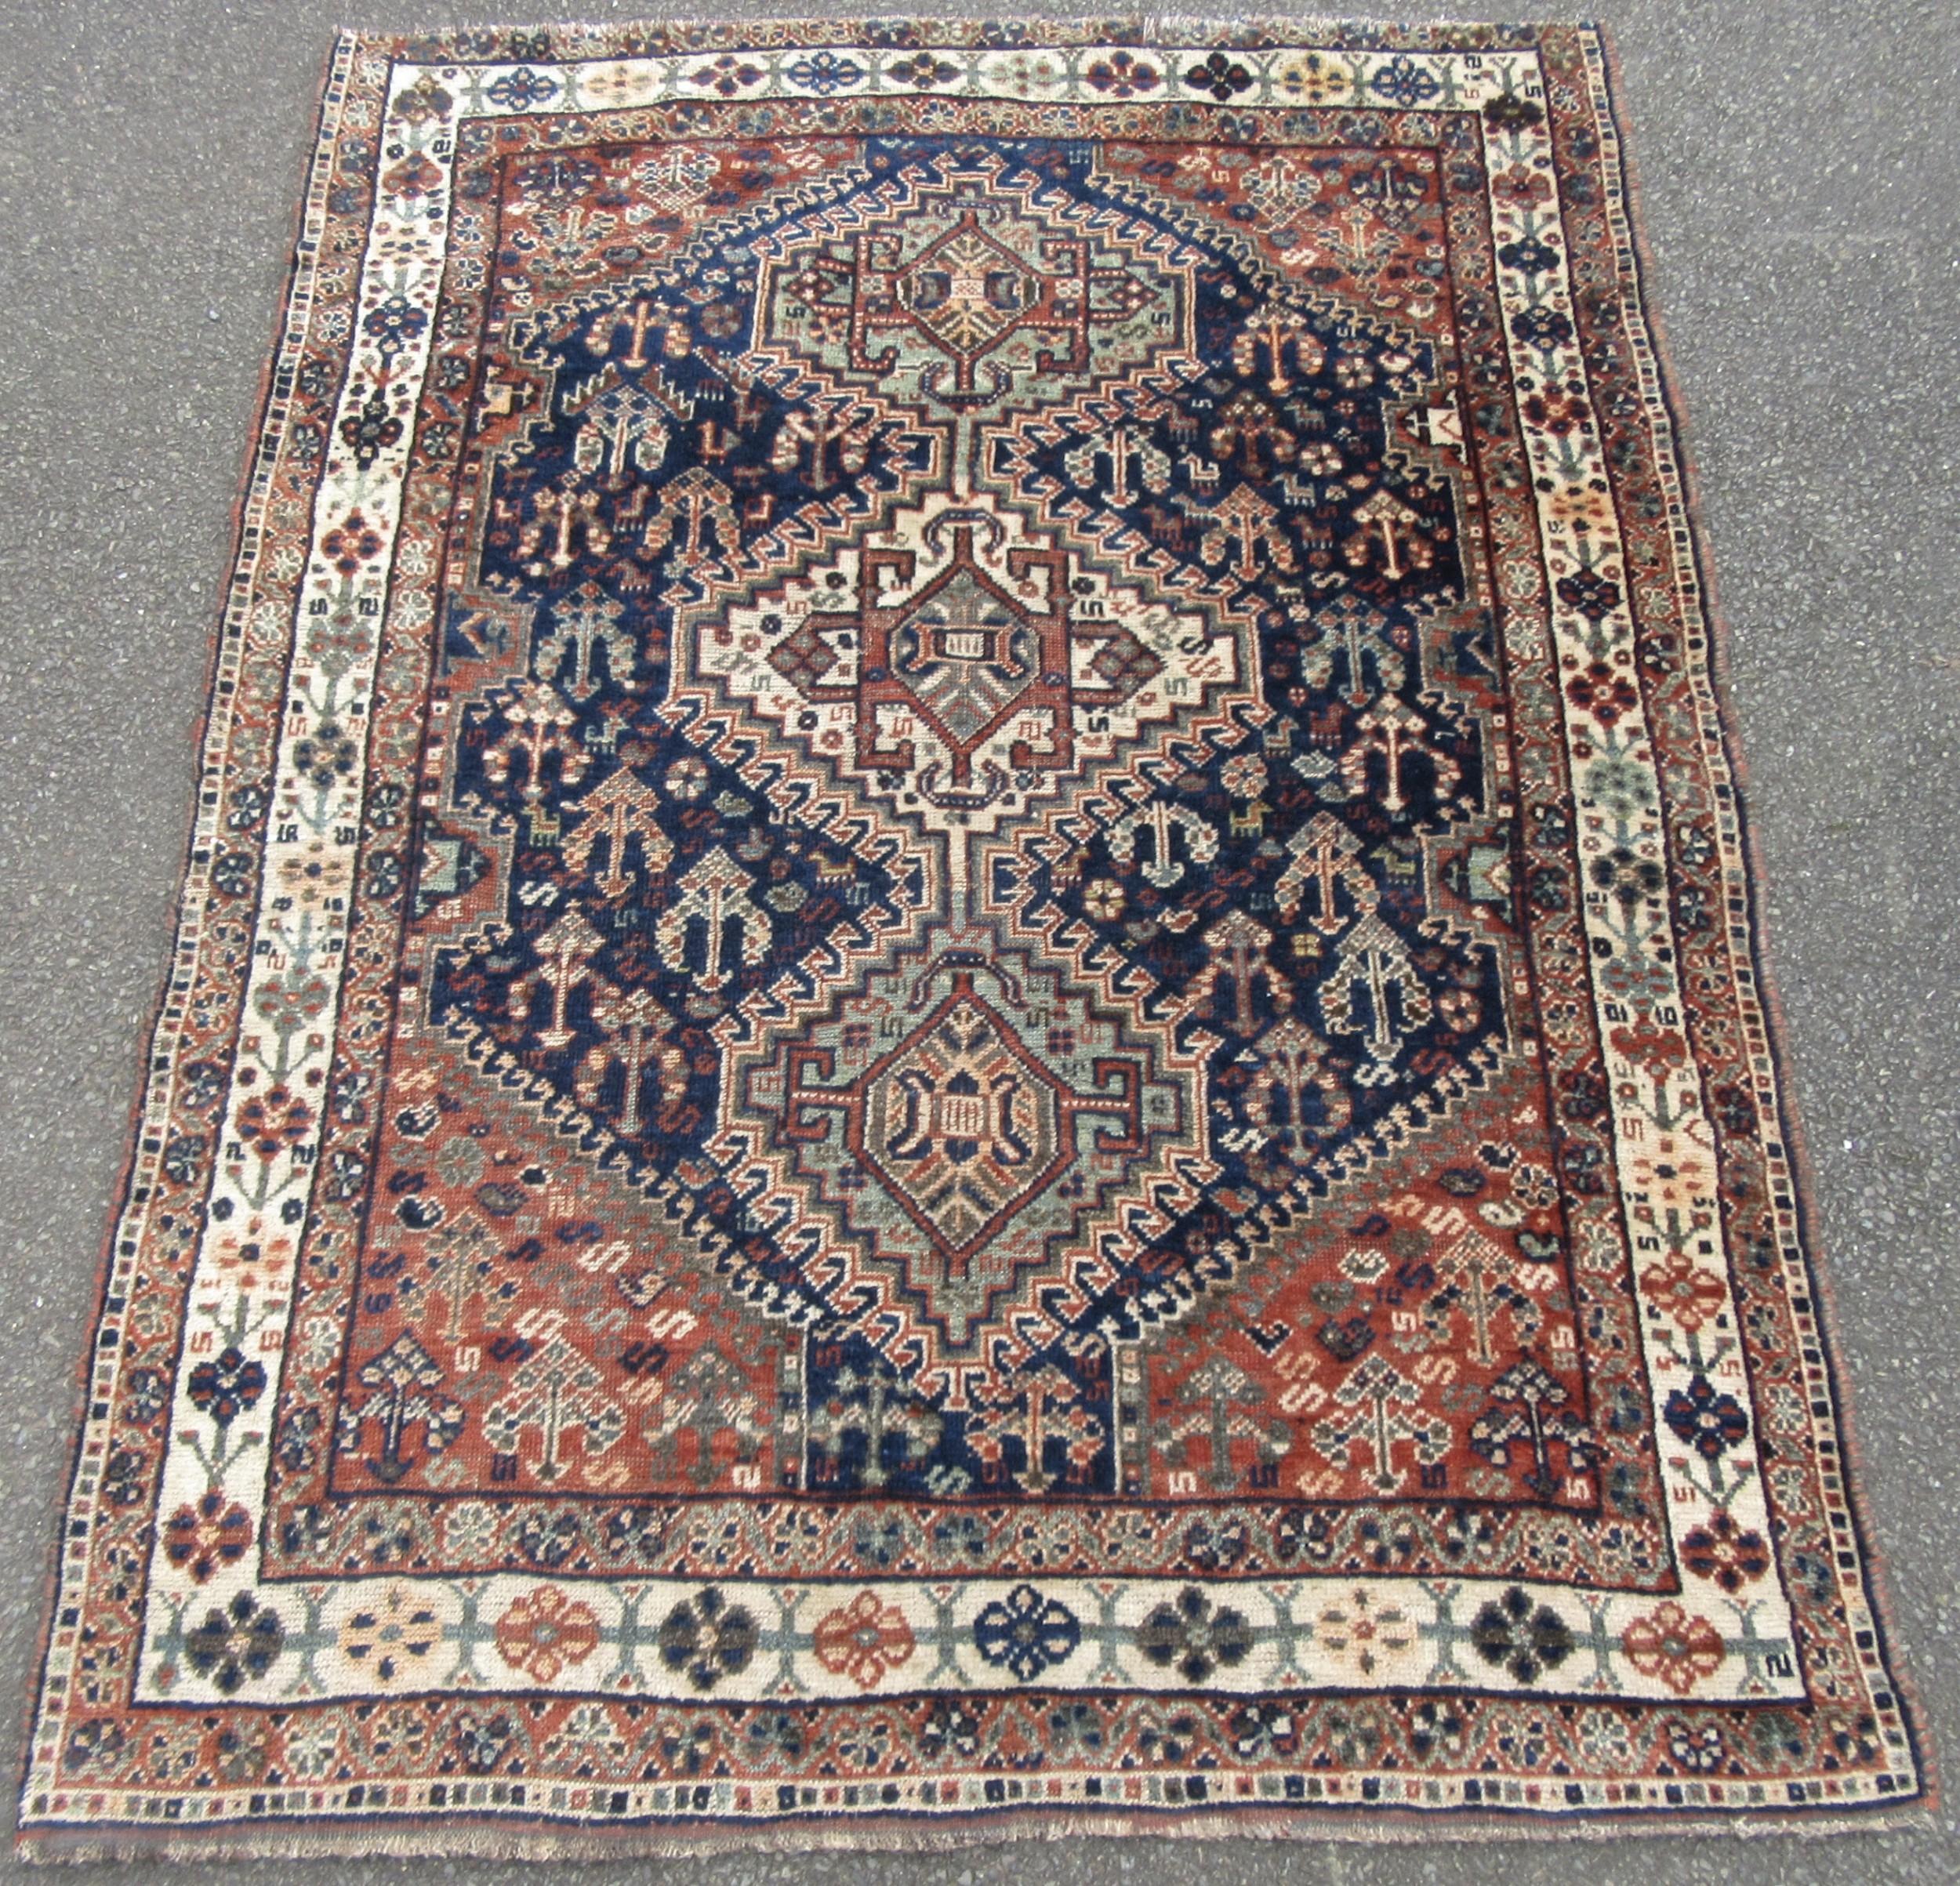 antique persian khamseh morghi confederacy rug myriads of animal bird motifs